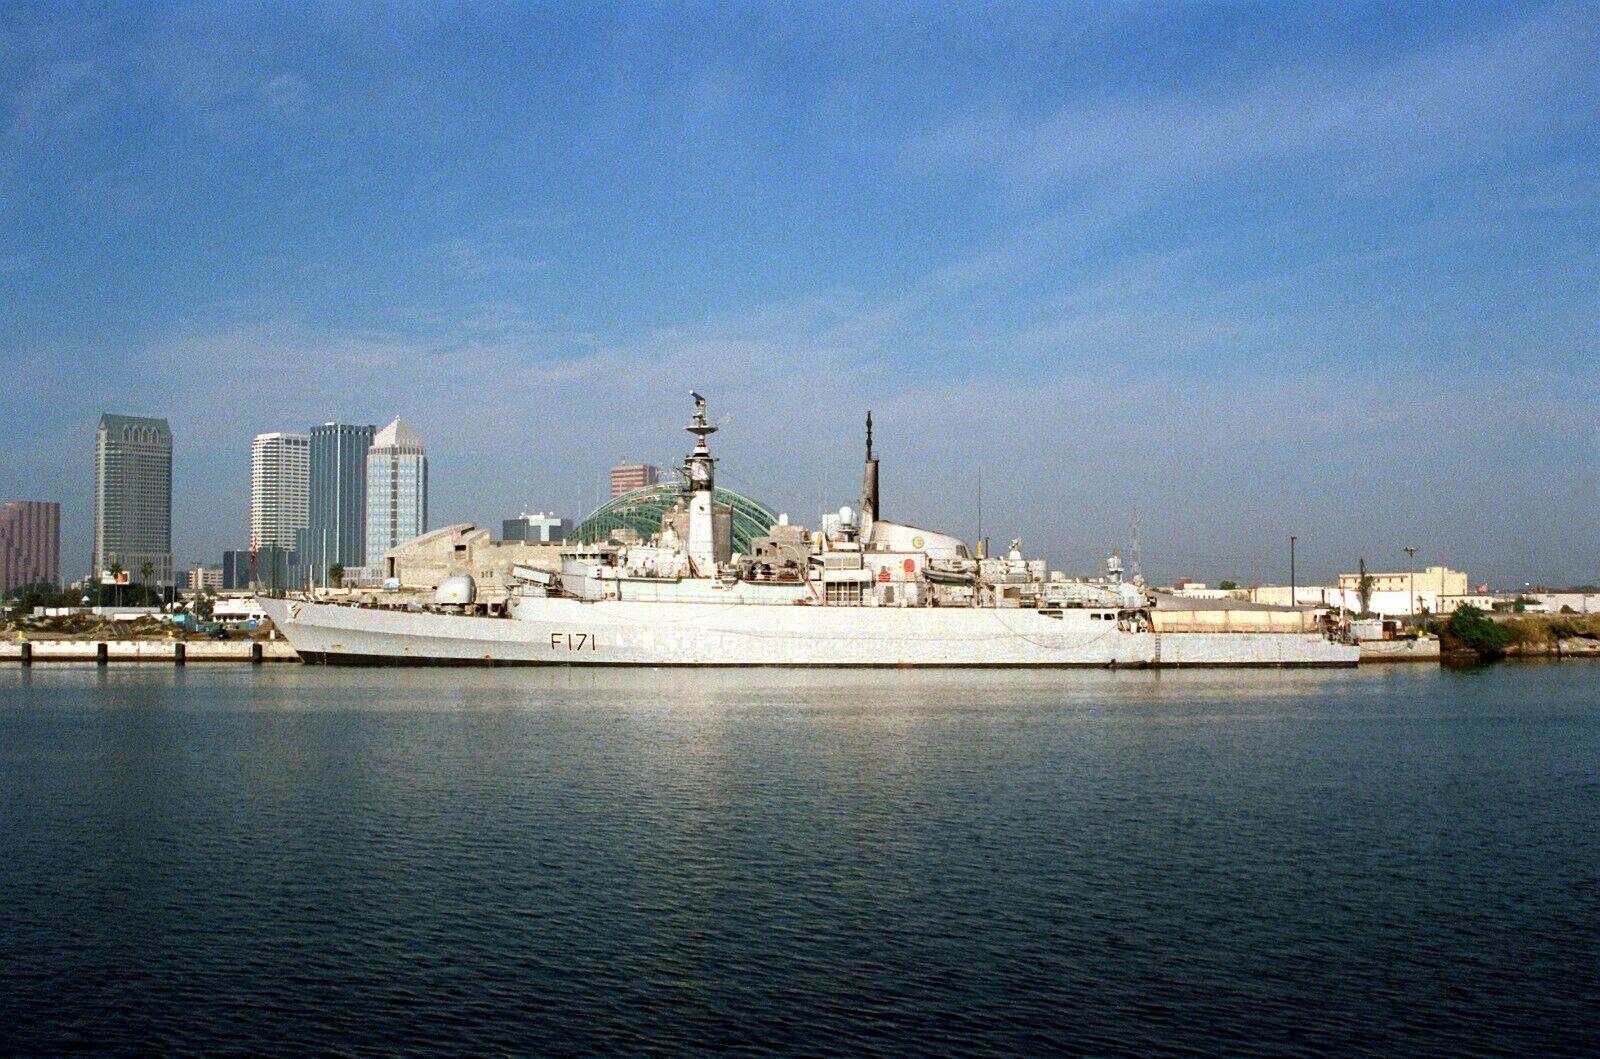 HMS ACTIVE (F-171)  Military Photo print